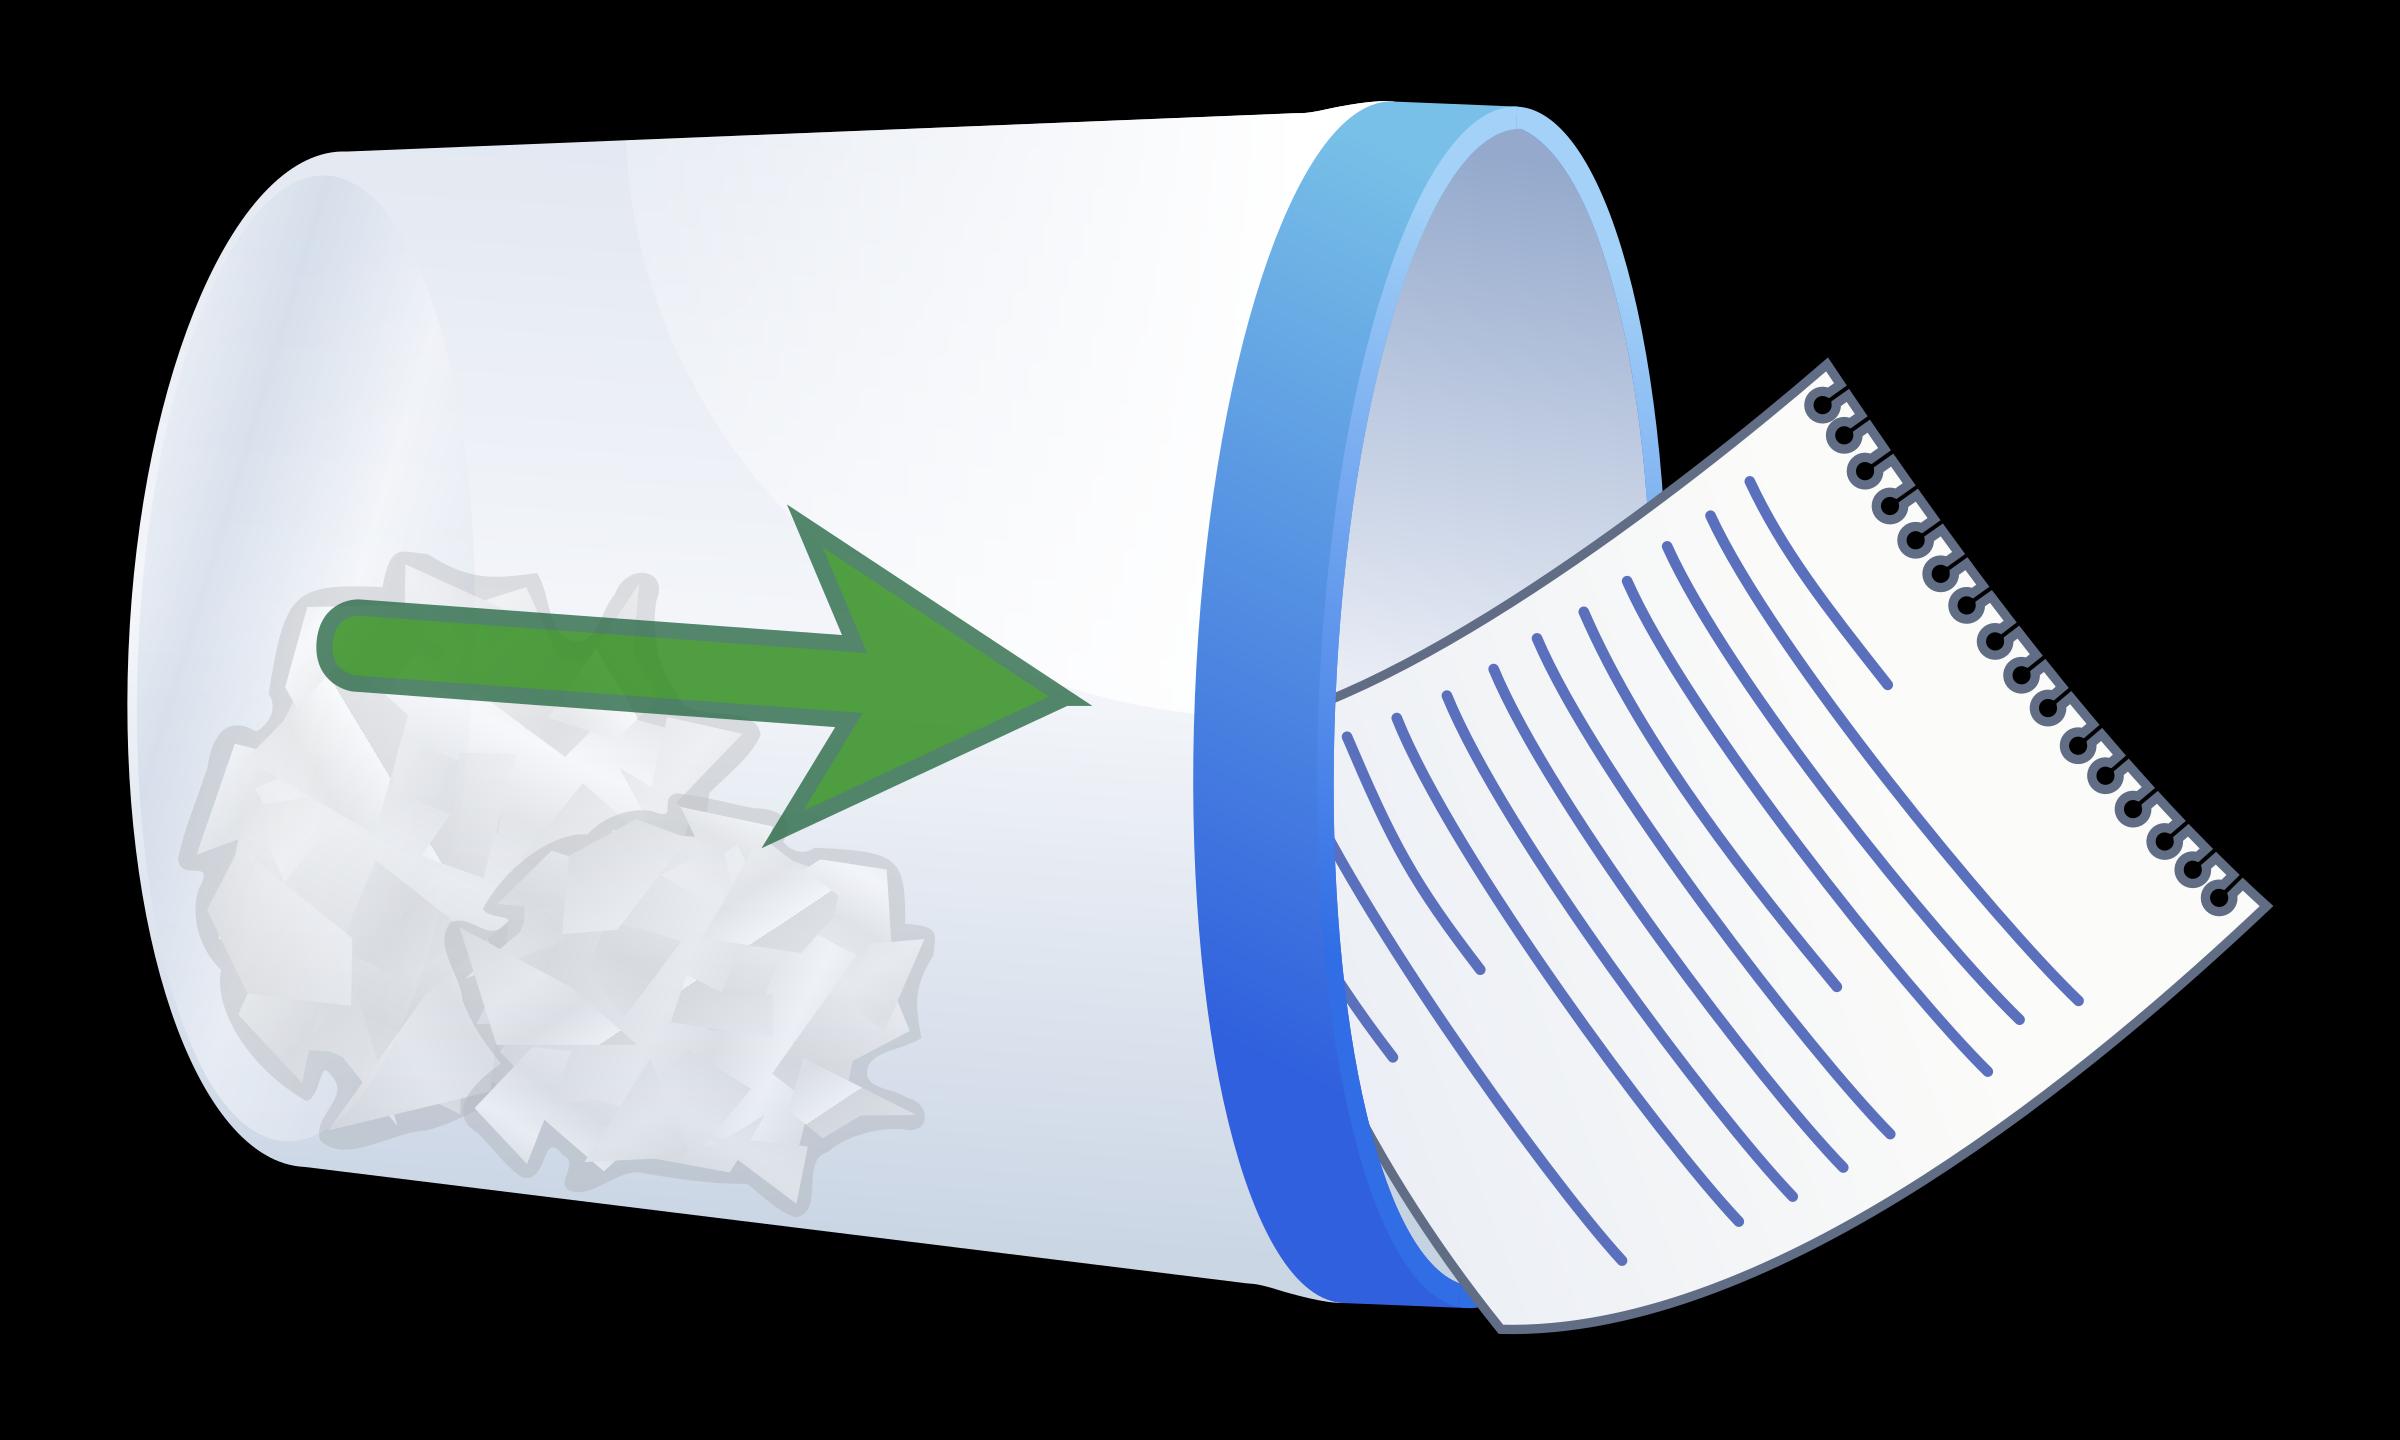 Trash bins big image. Garbage clipart paper